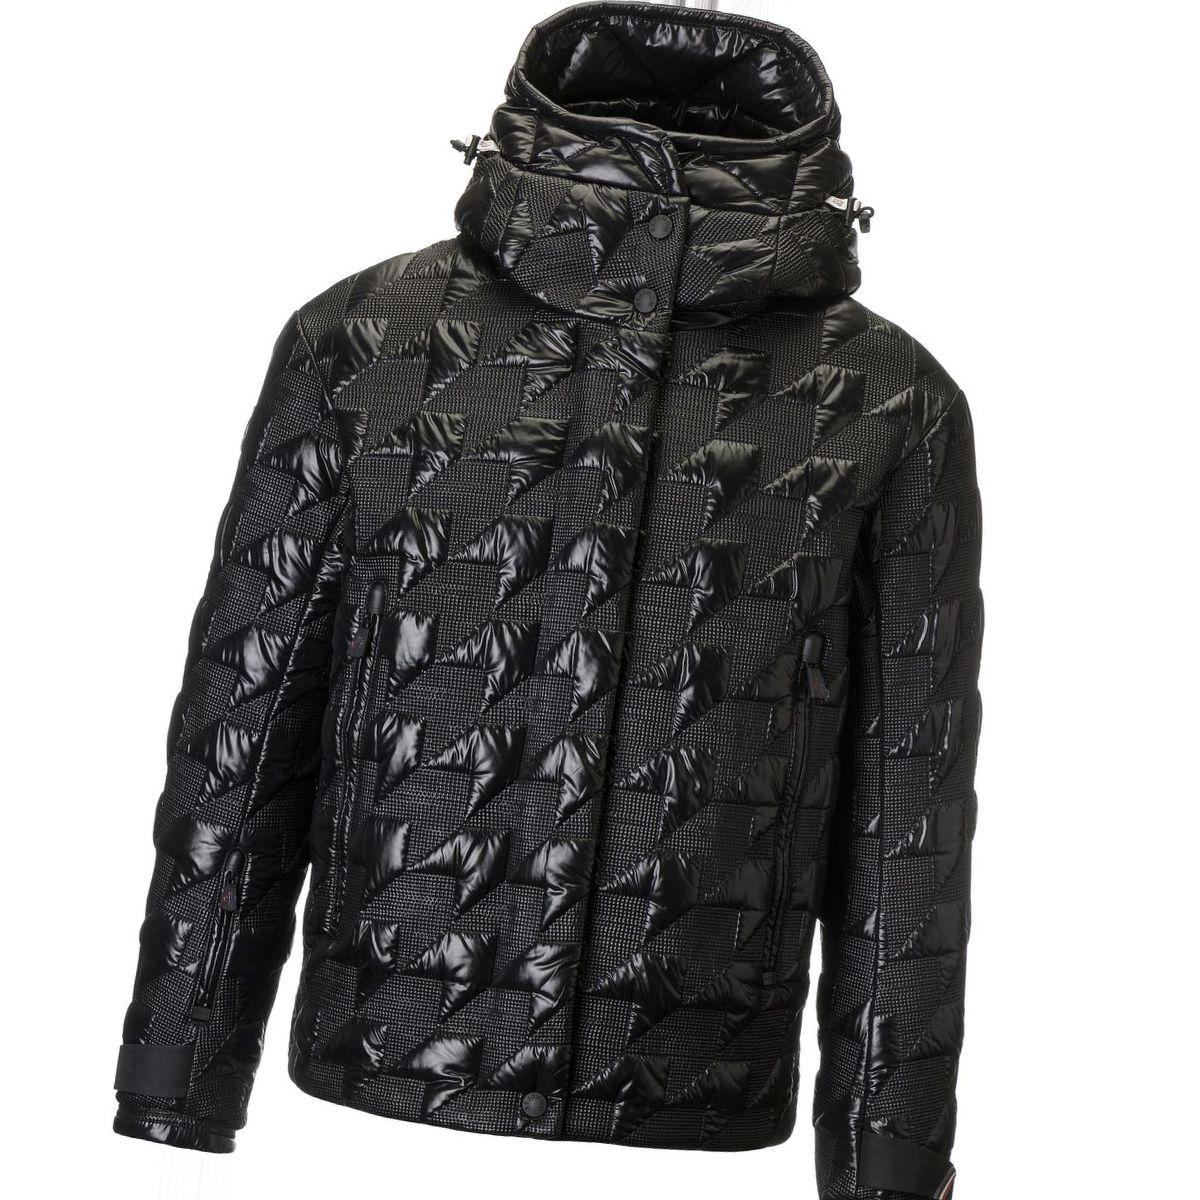 Moncler Bussang Giubbotto Jacket - Men's